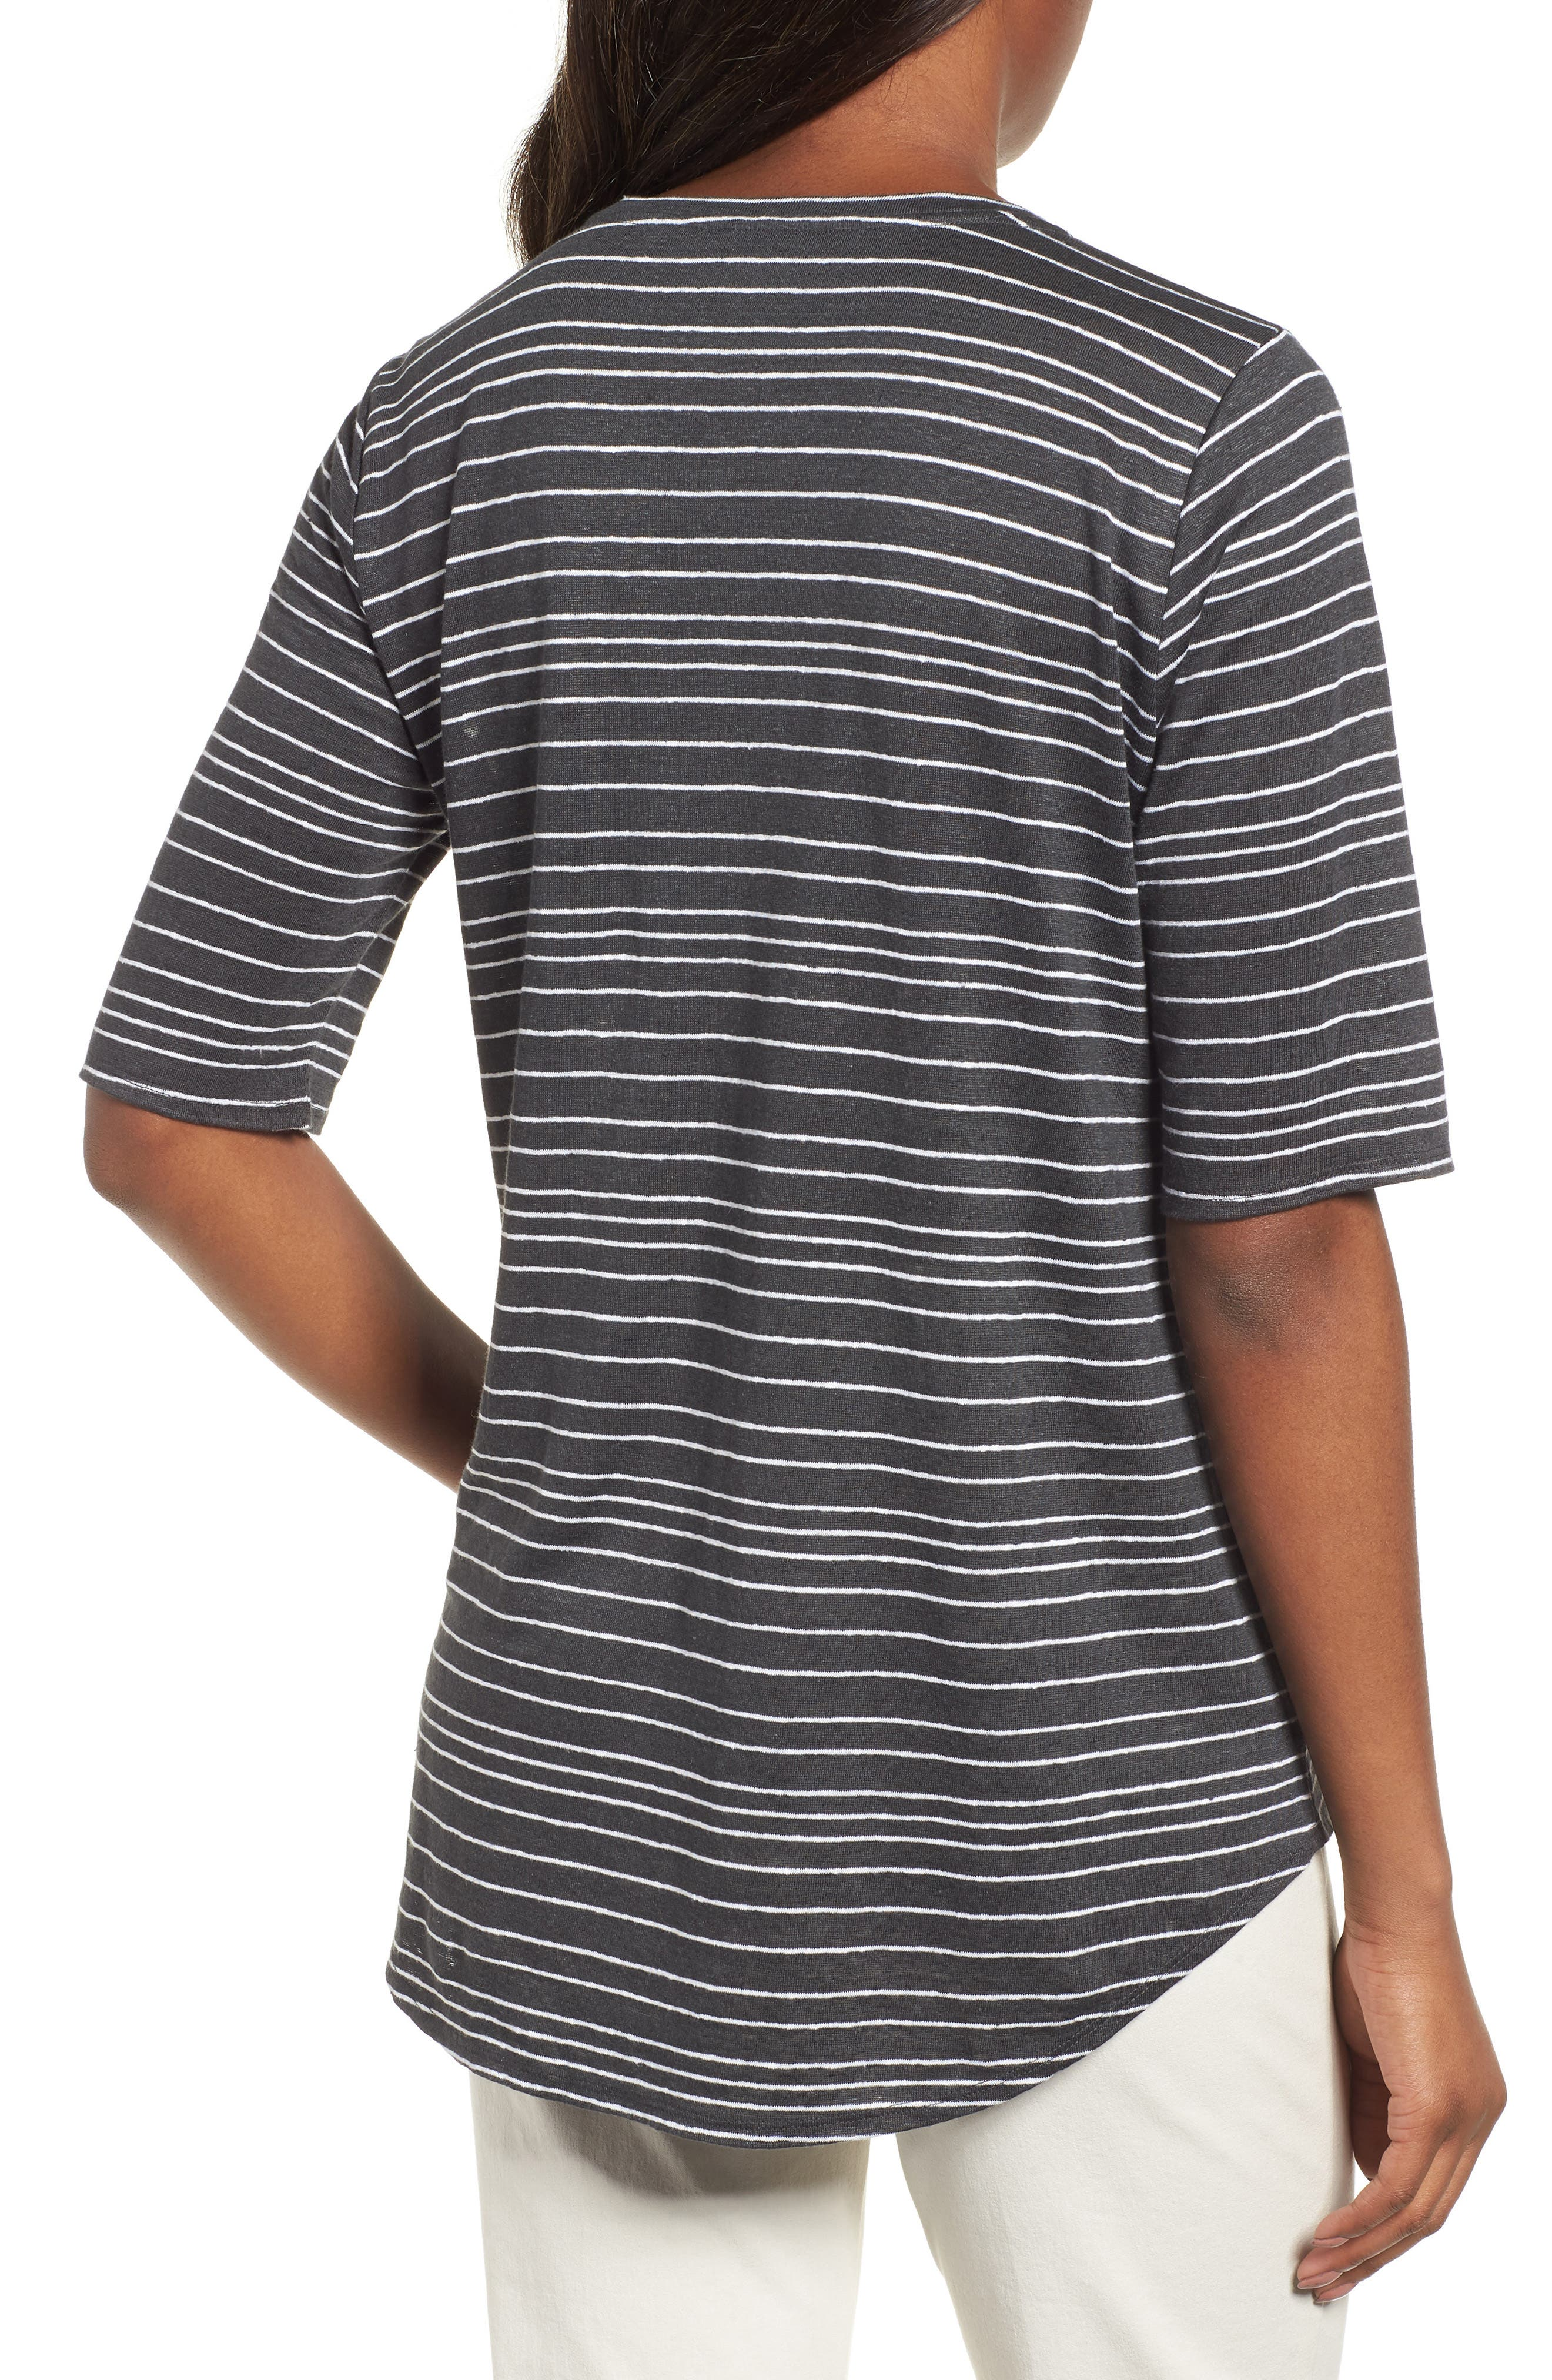 Stripe Organic Linen Top,                             Alternate thumbnail 2, color,                             025